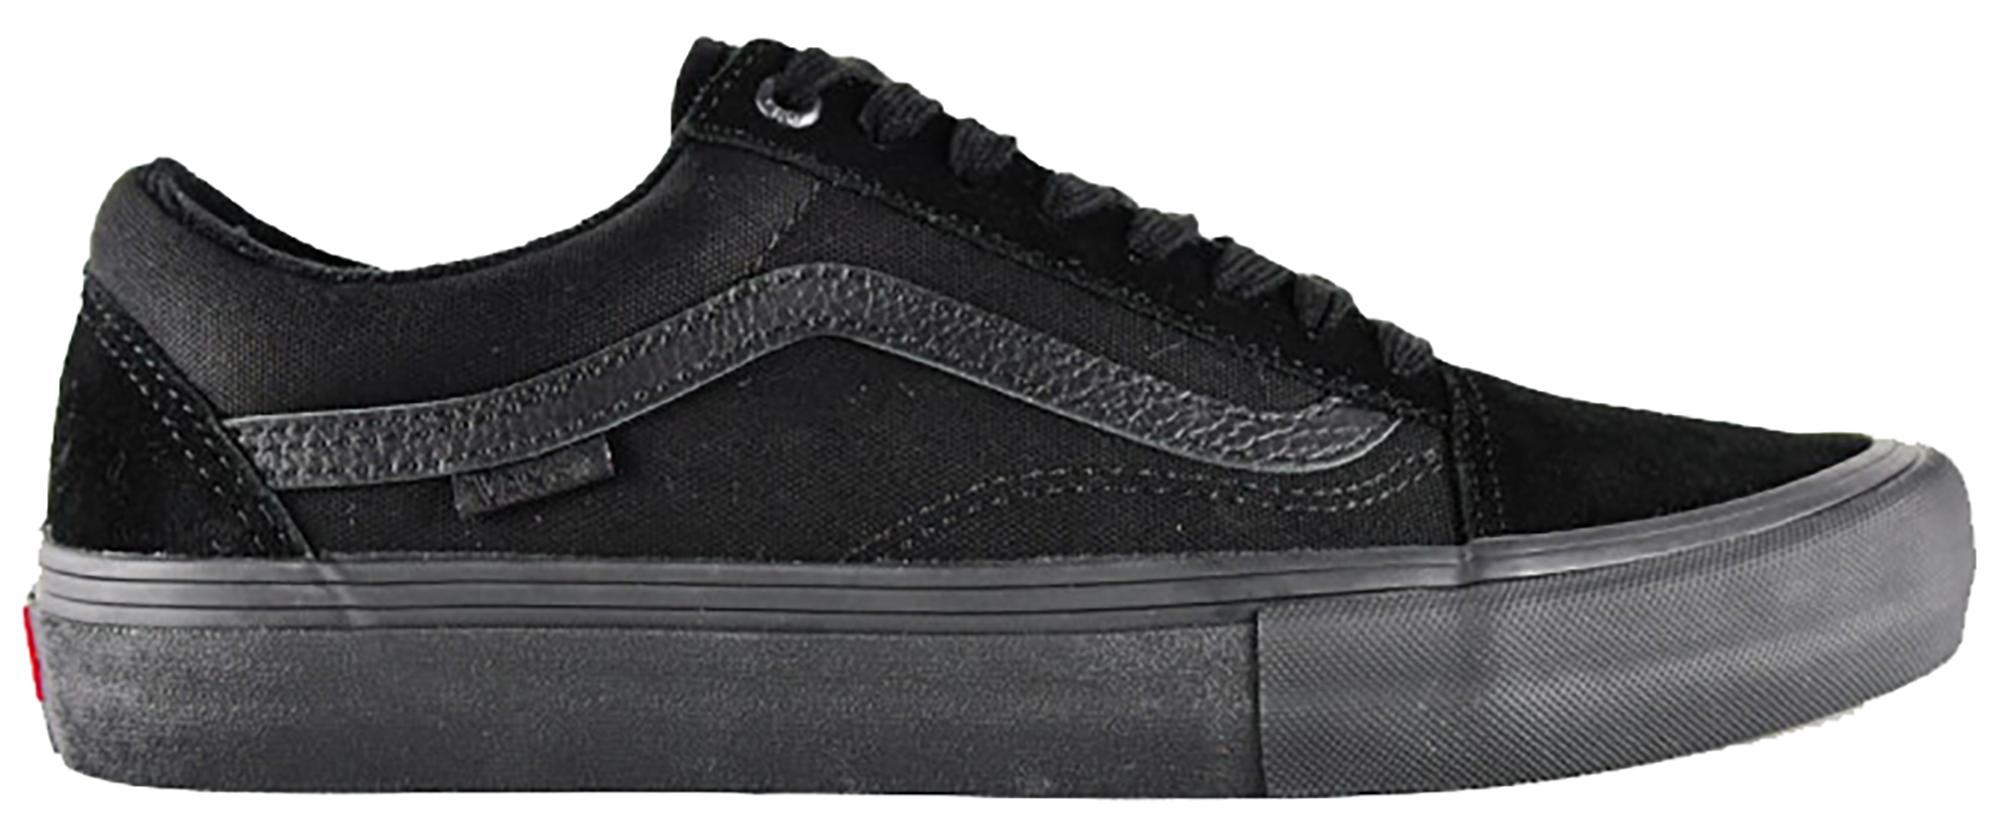 vans old skool pro all black